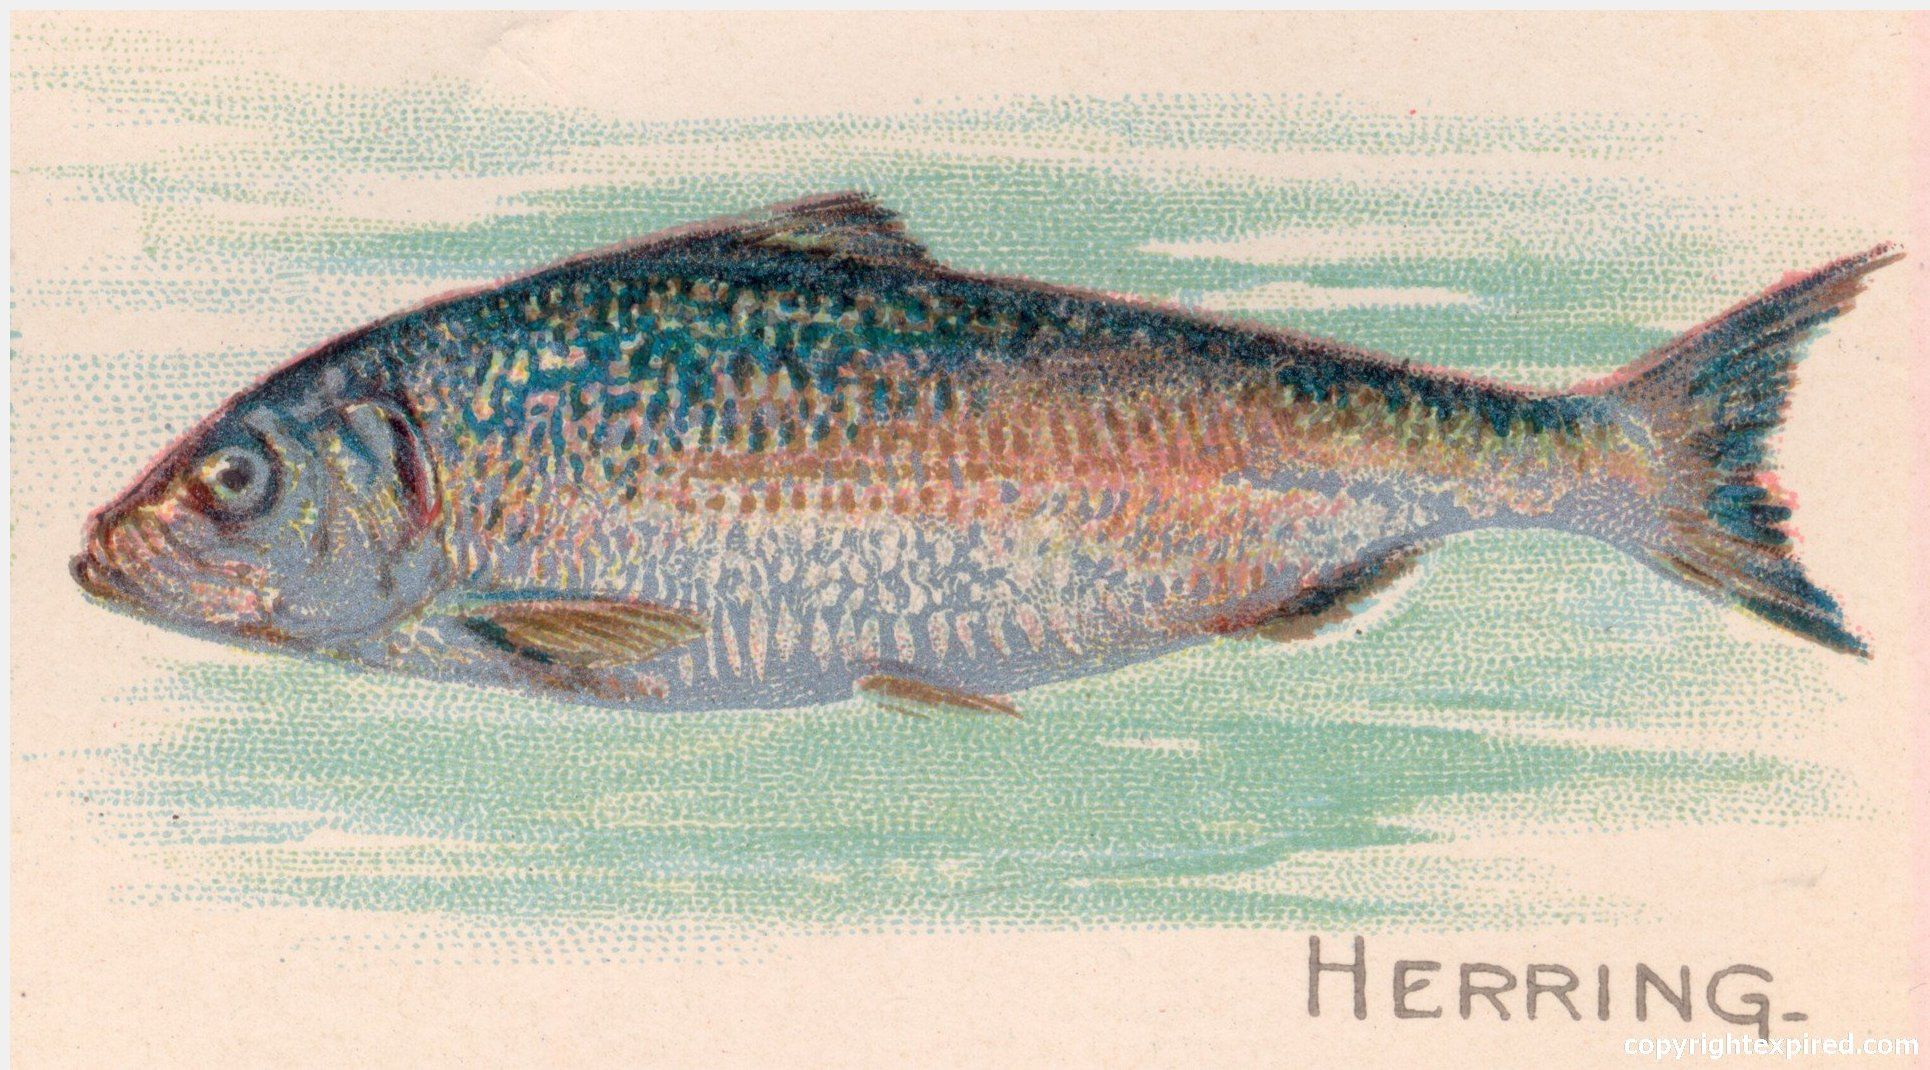 herring illustrations - Google Search